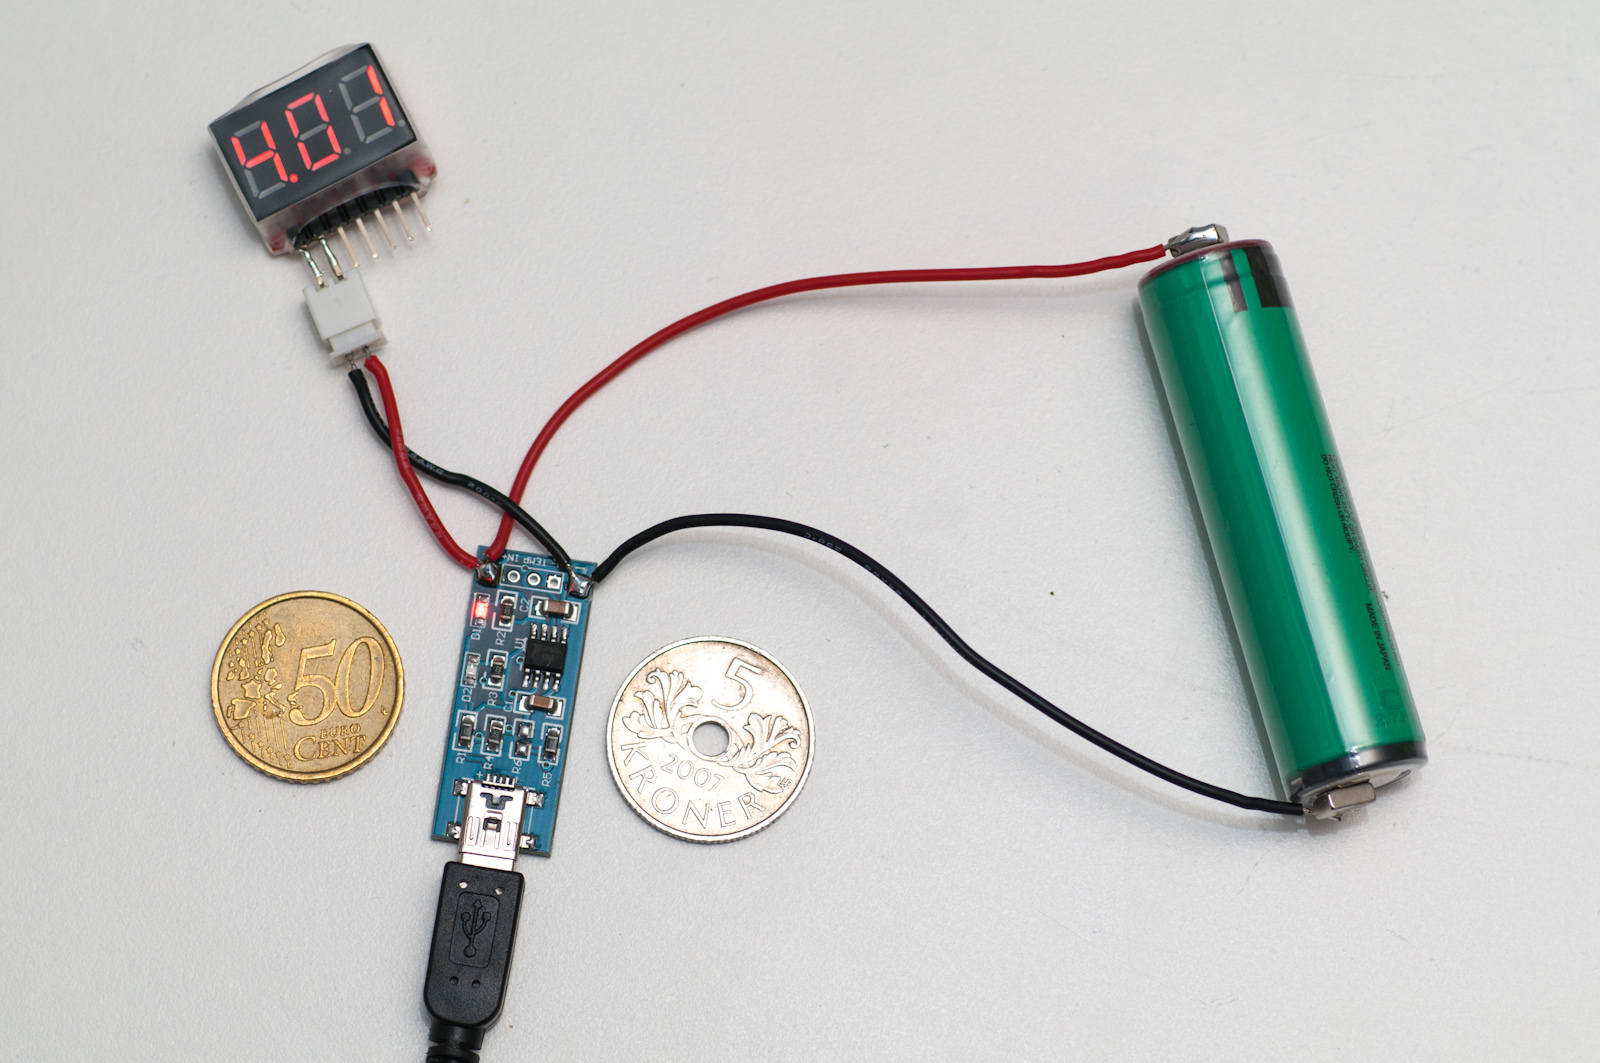 TP4056 LIPO LI-ION Lithium Battery Charging Board Mini USB